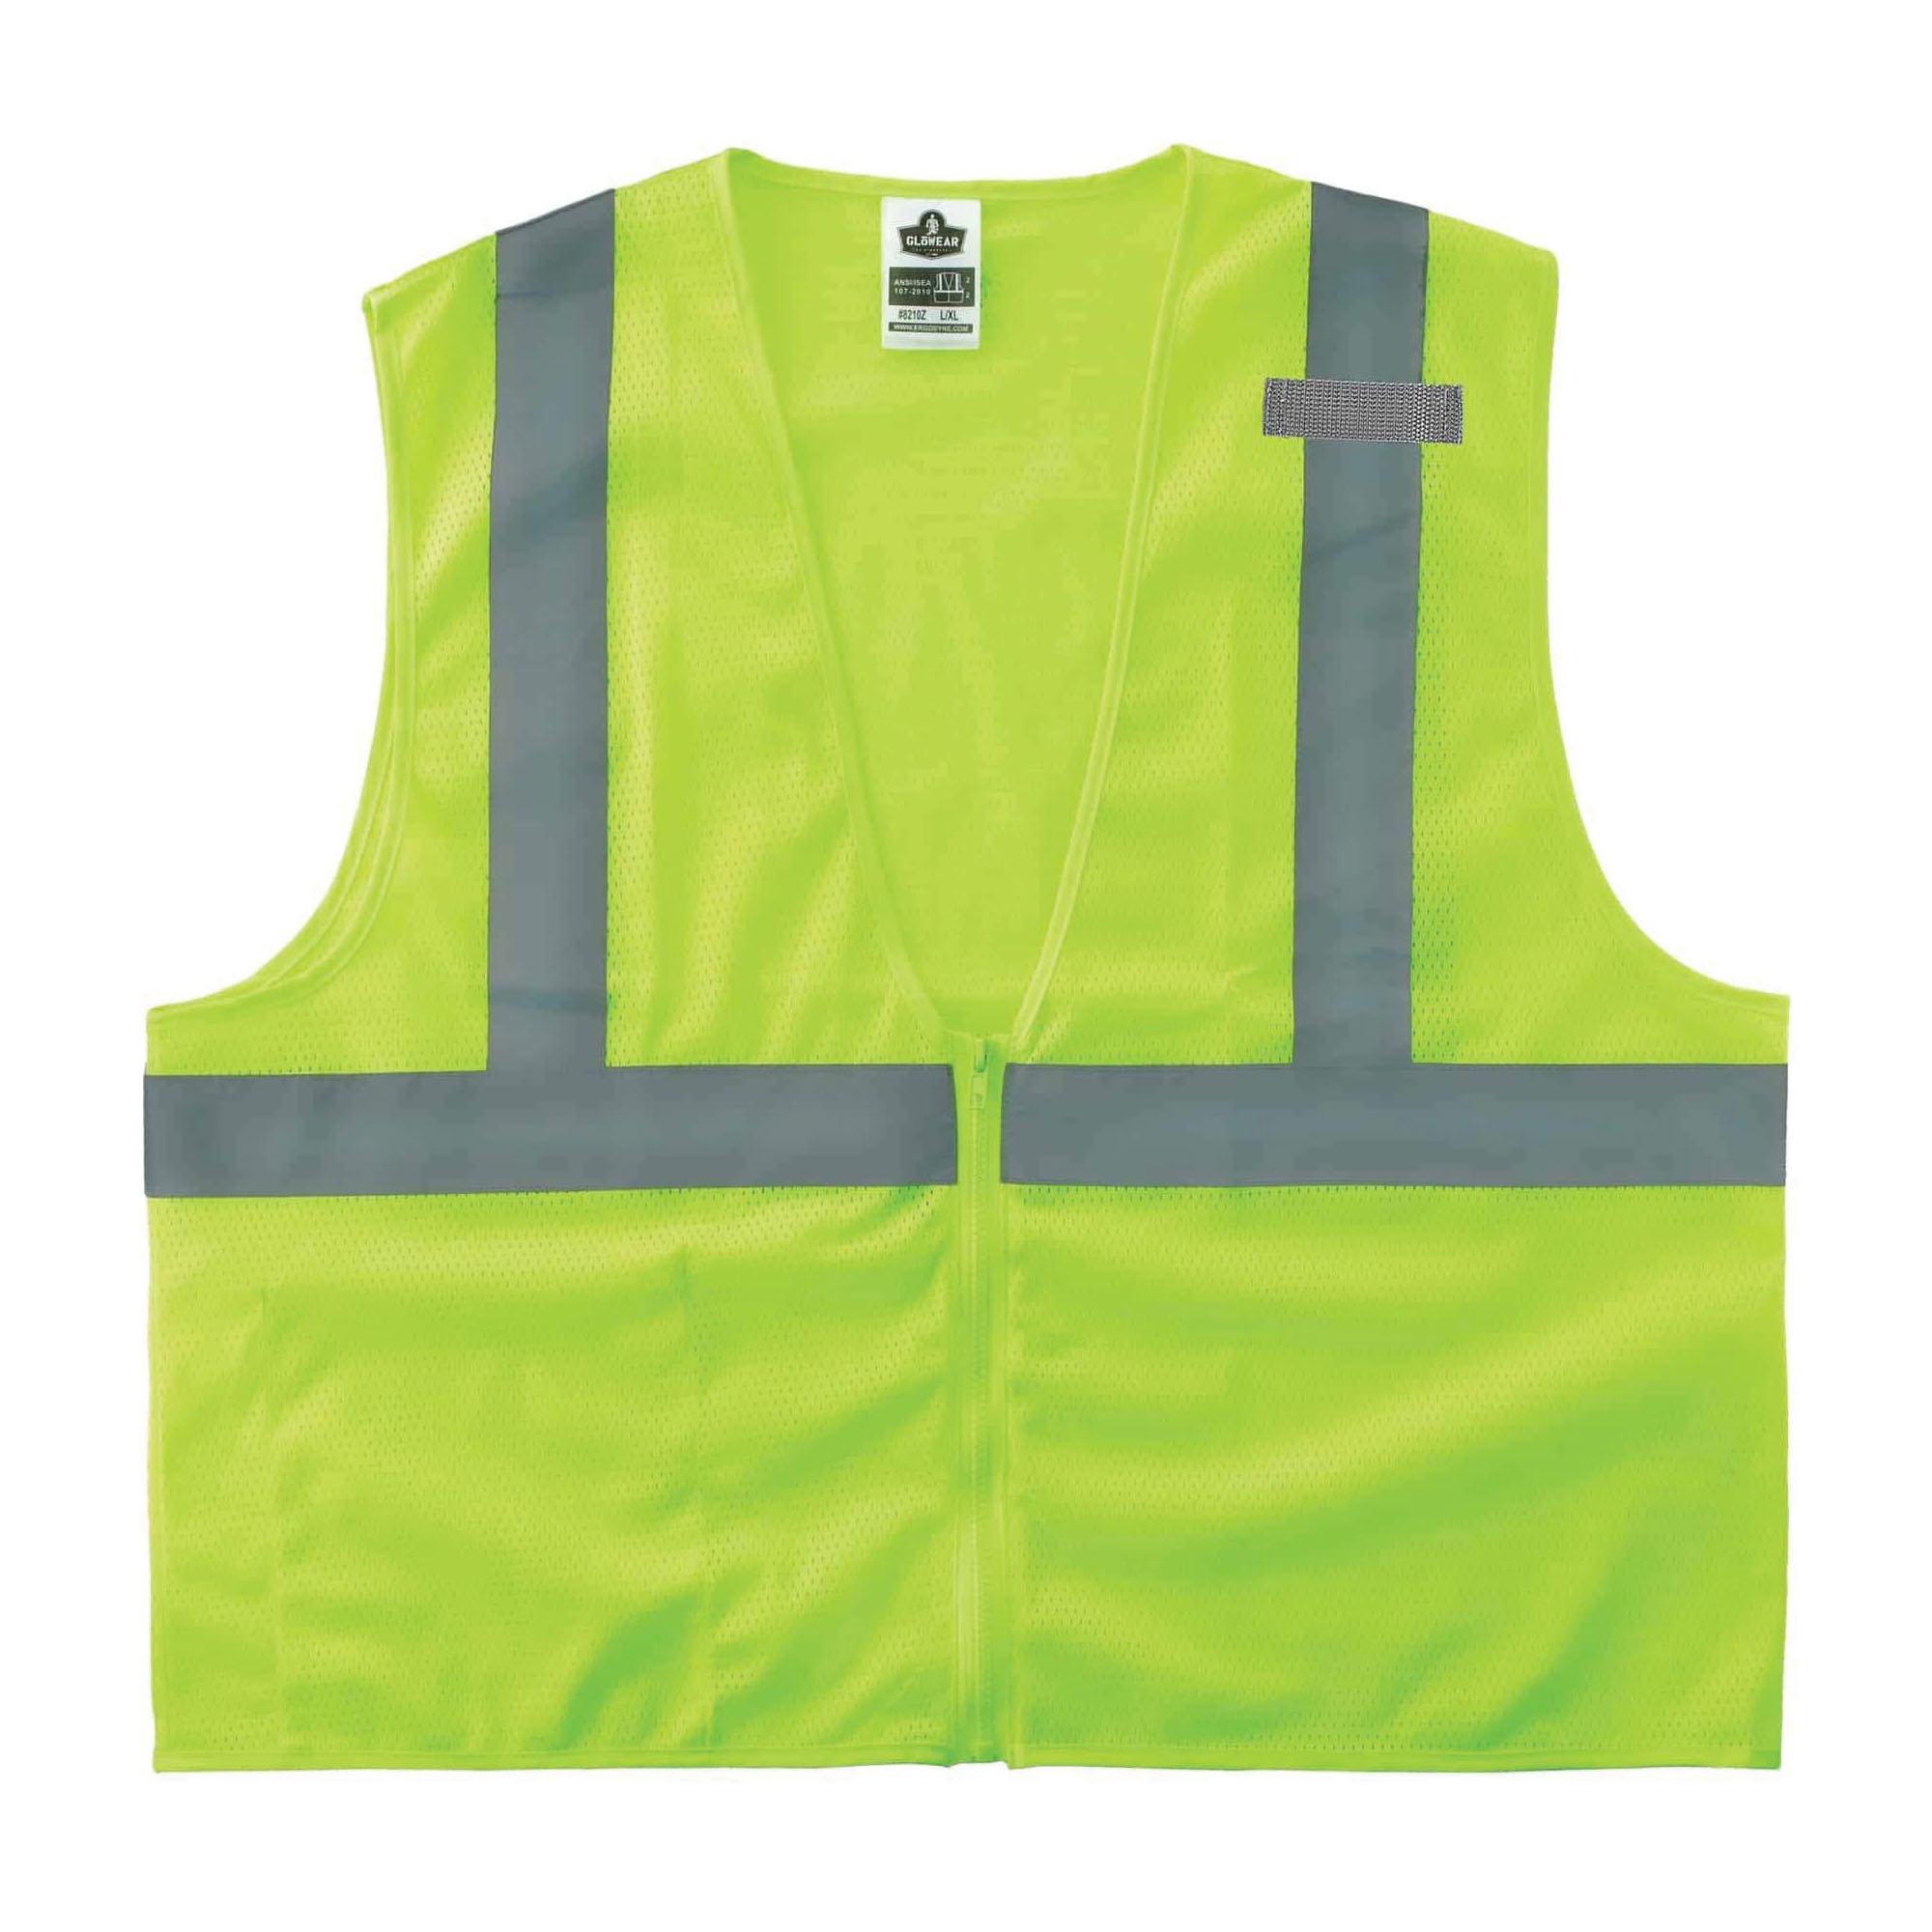 Ergodyne® GloWear® 8210Z Economy Standard Vest, Hi-Viz Orange, Polyester Mesh, Zipper Closure, 1 Pockets, ANSI Class: Class 2, Specifications Met: ANSI/ISEA 107-2015 Type R, Lime or Orange, Various Sizes